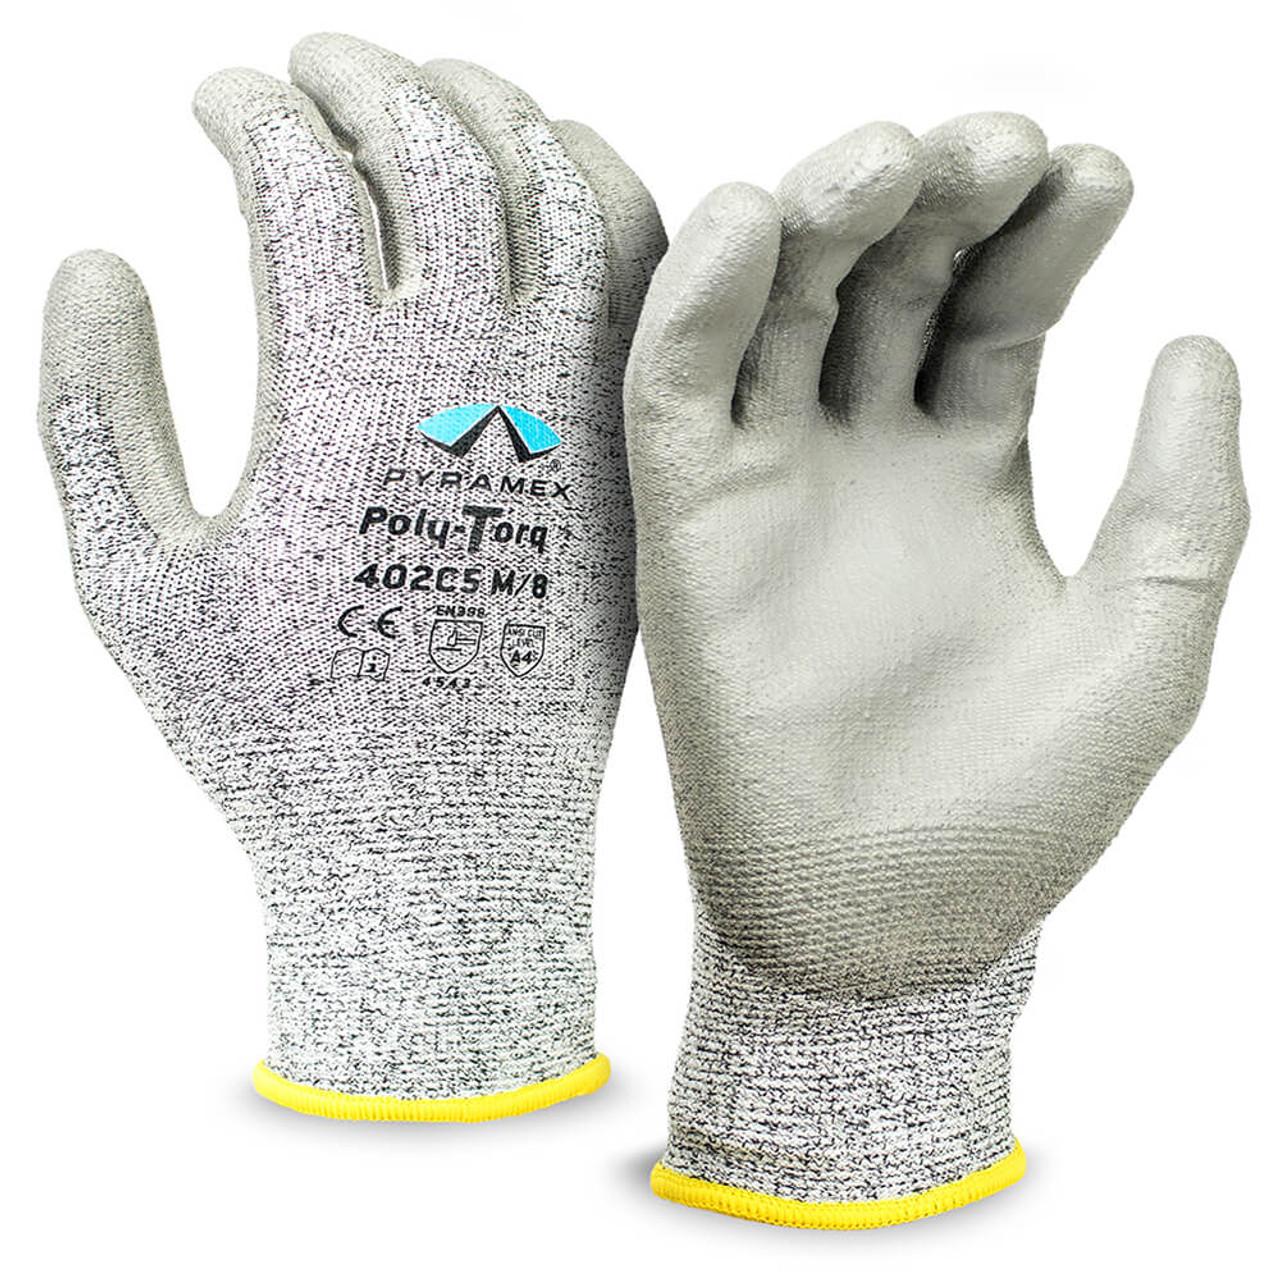 Micro-Foam Pyramex Safety CorXcel Nitrile Glove X-Large